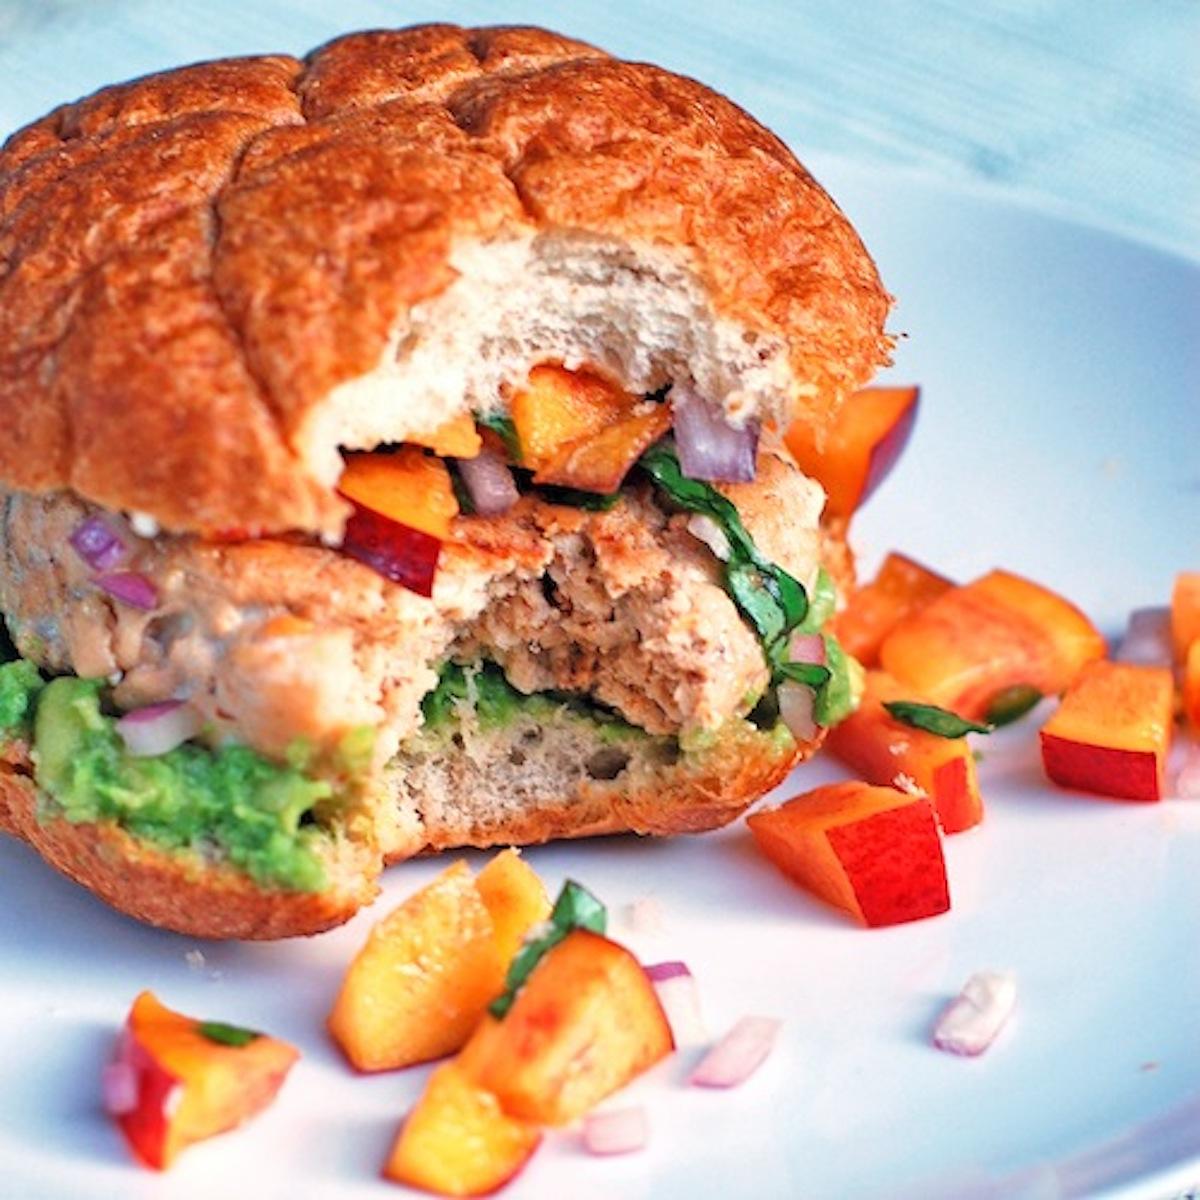 Chipotle burger recipe